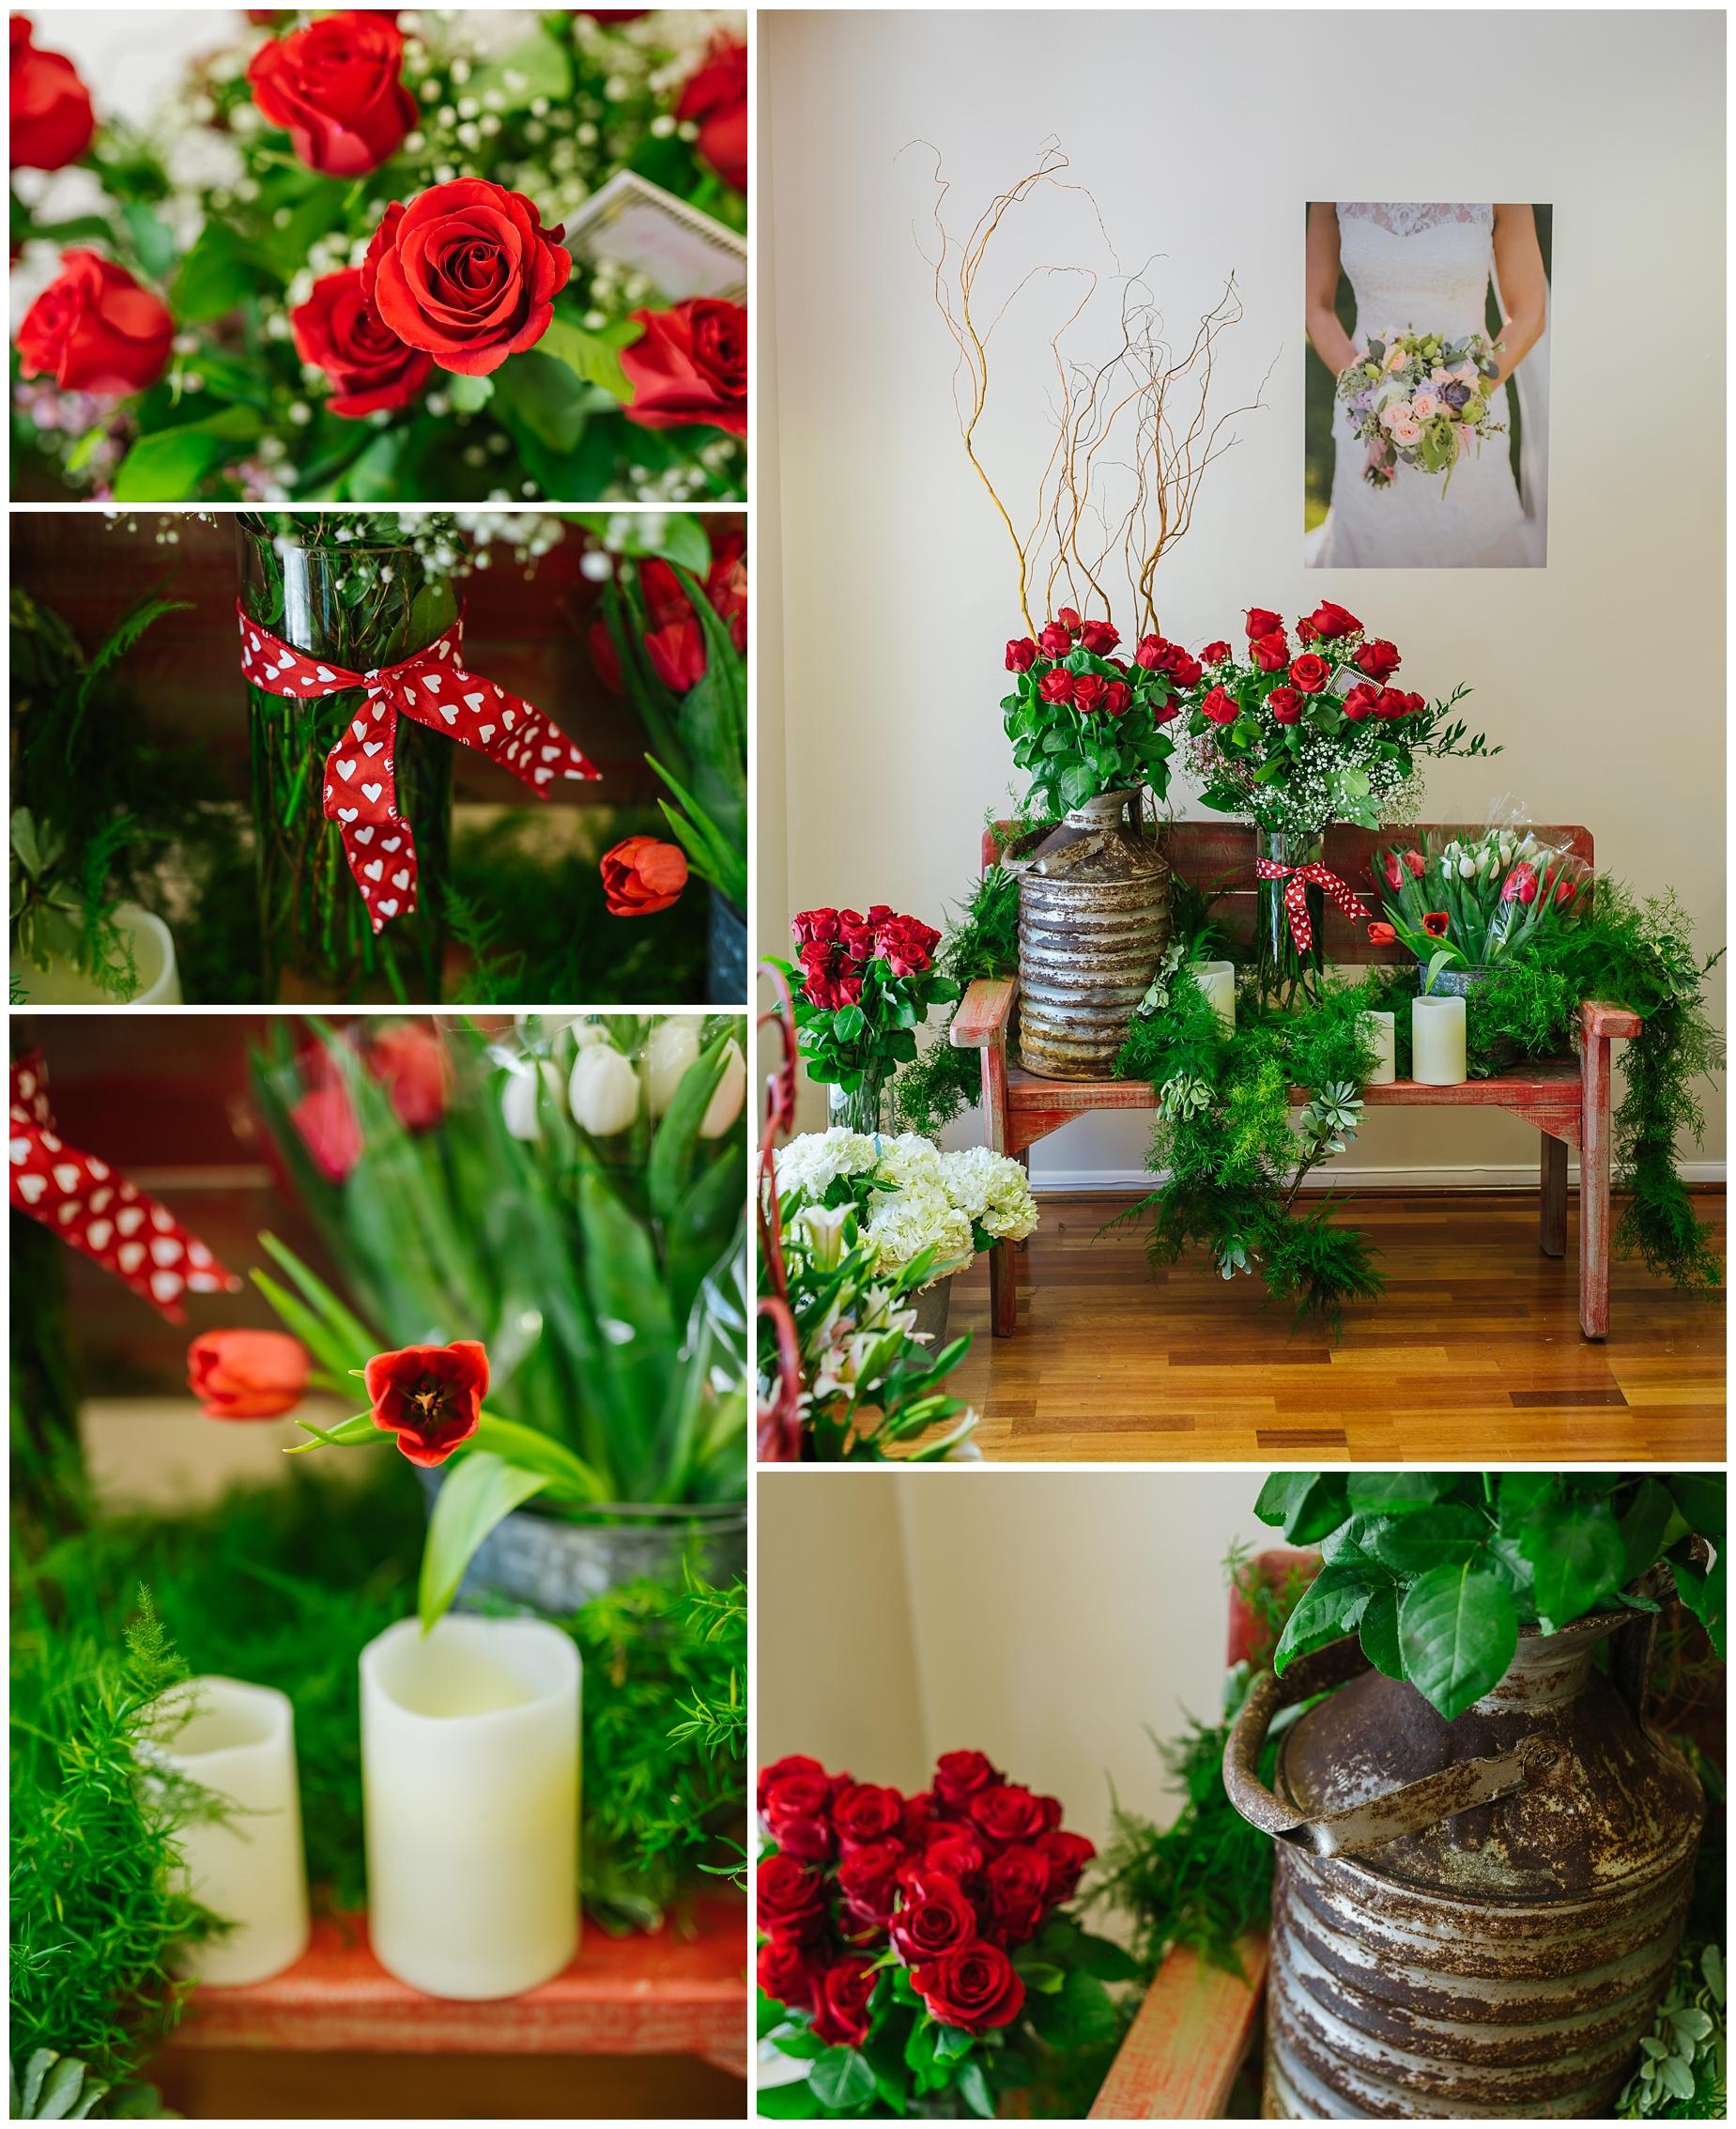 tampa-wedding-photographer-hyde-park-village-florist_0010.jpg